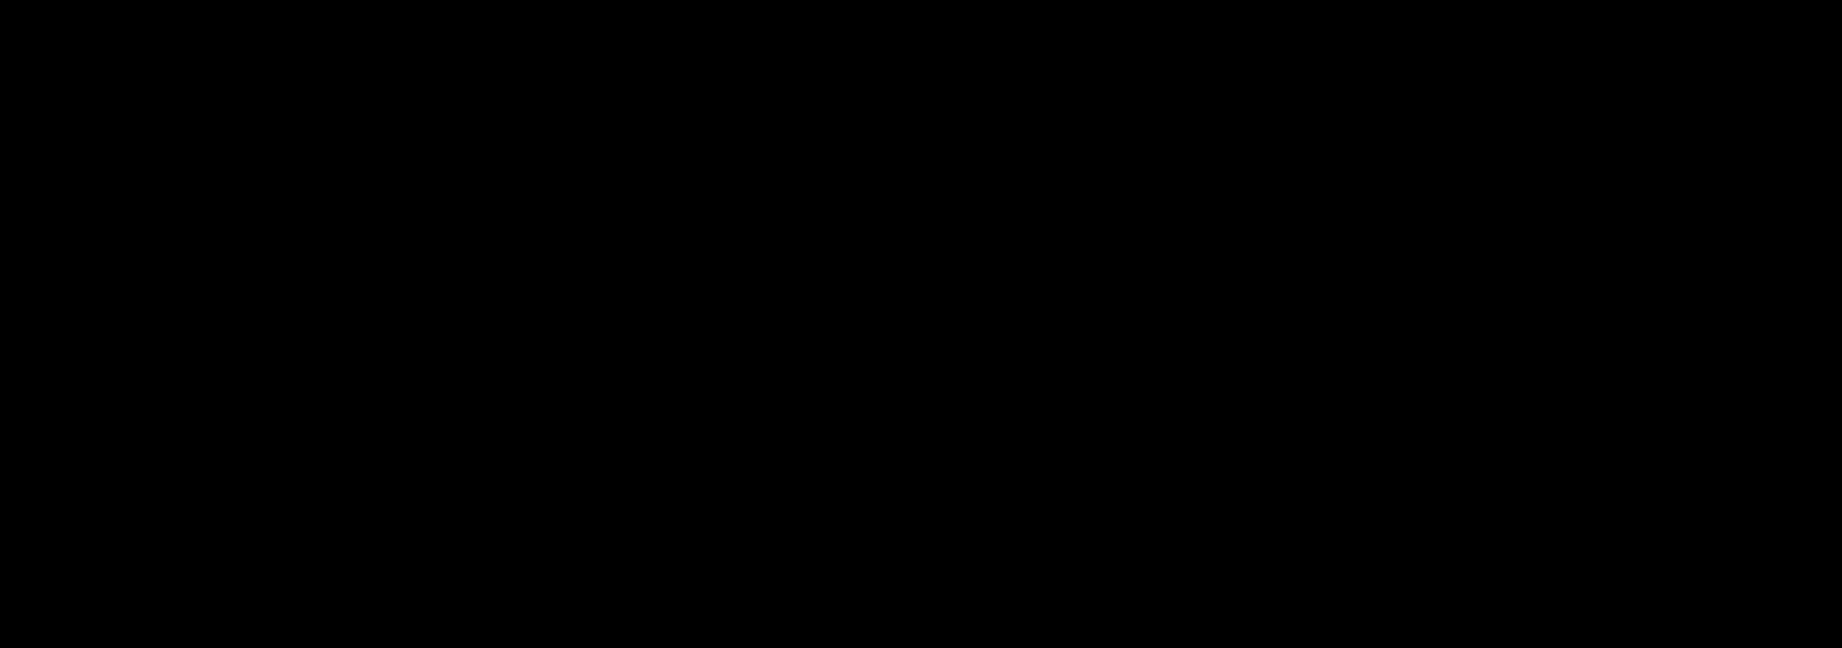 Cilostamide